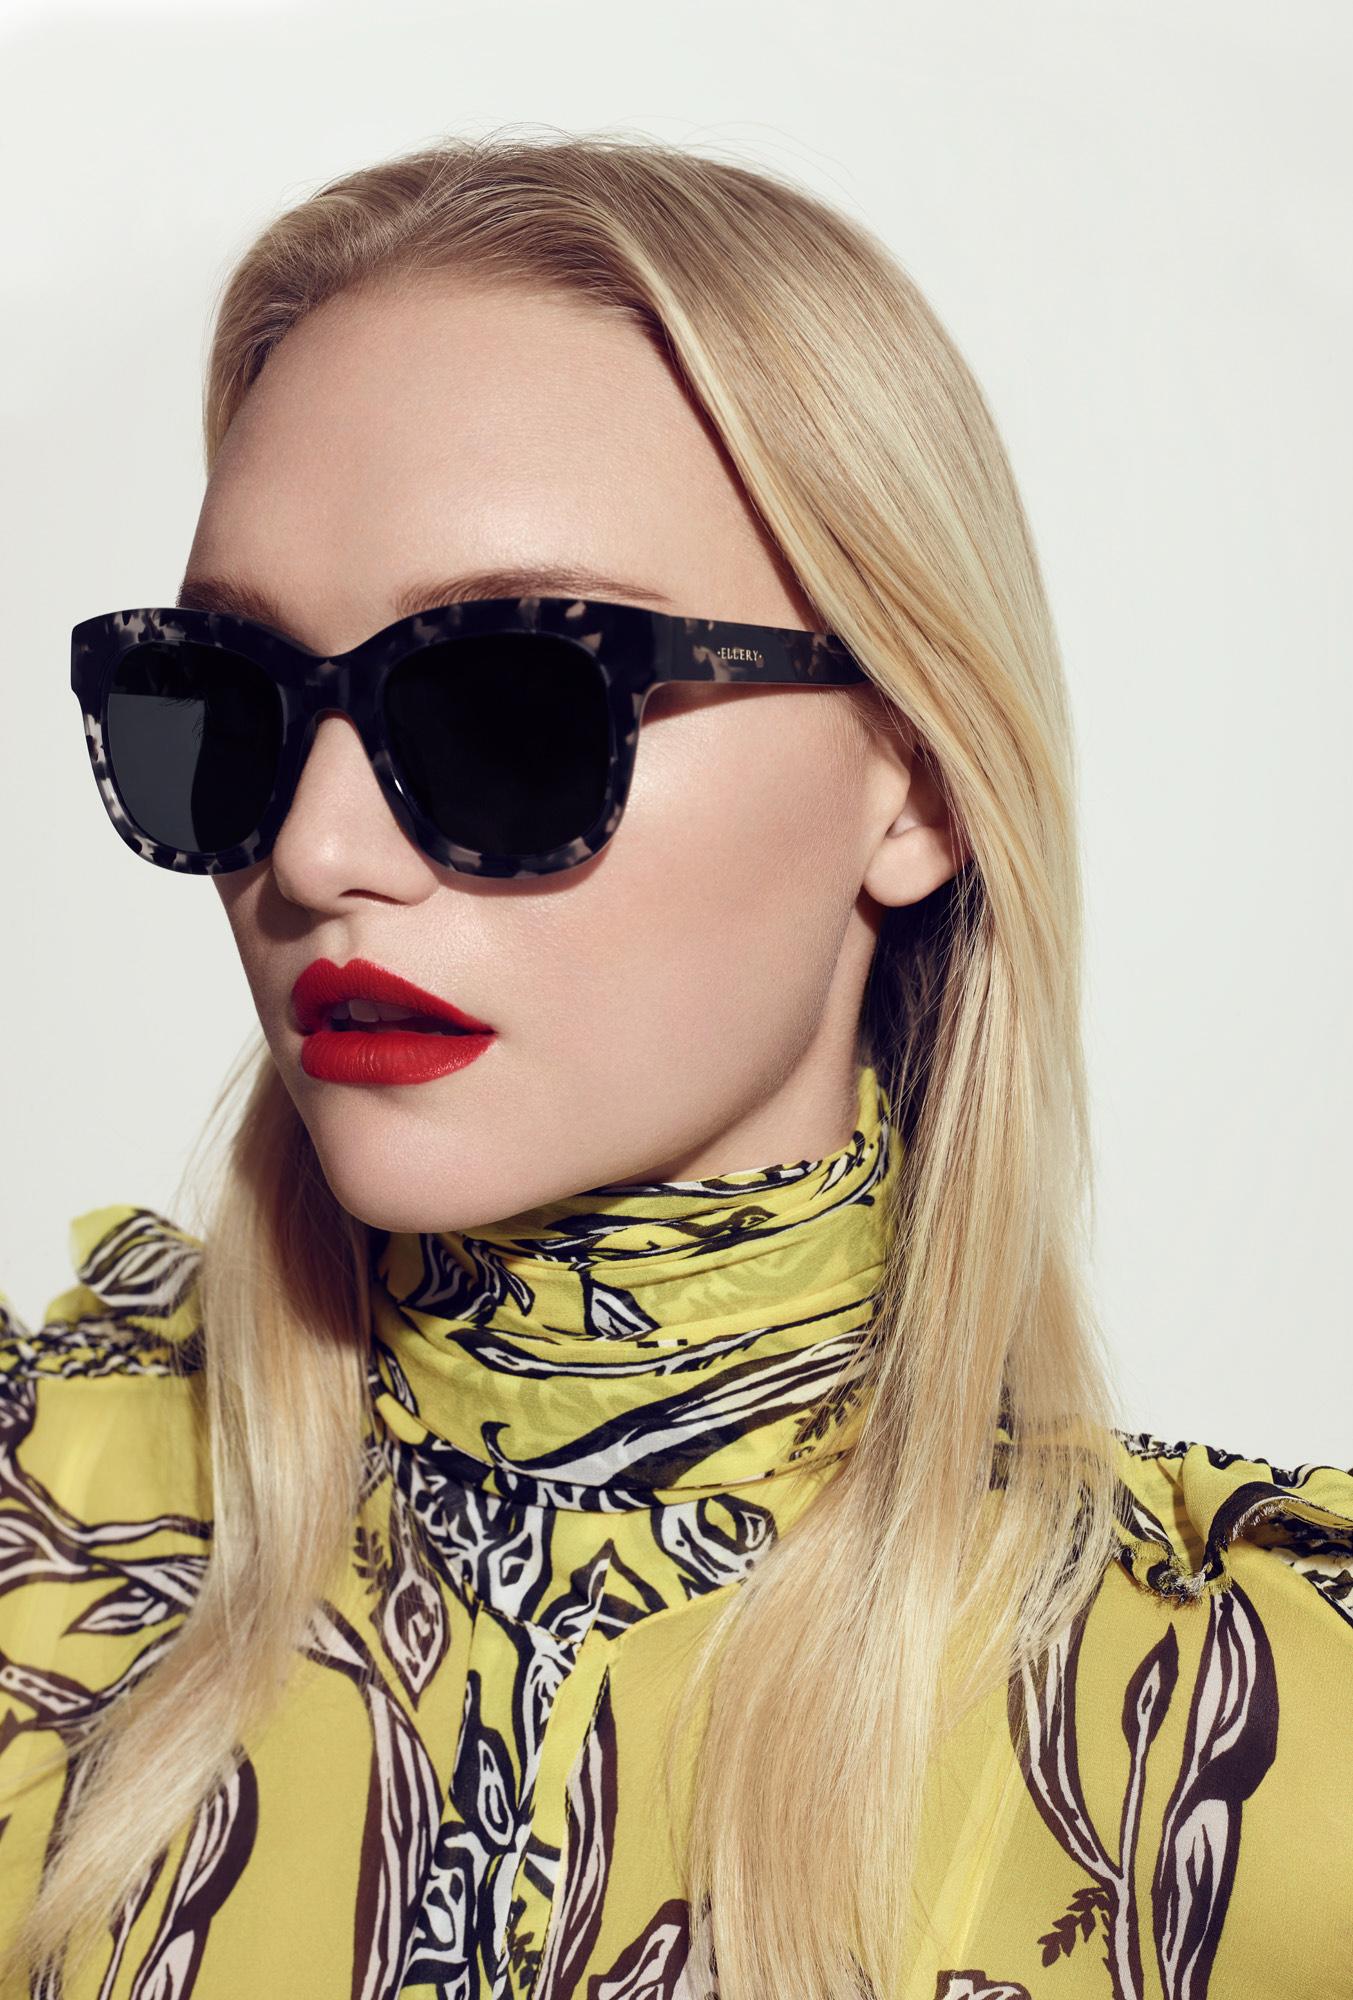 Gemma wears ELLERY SUN RX 03 glasses SKU 30474802 RRP 2 pairs from $369